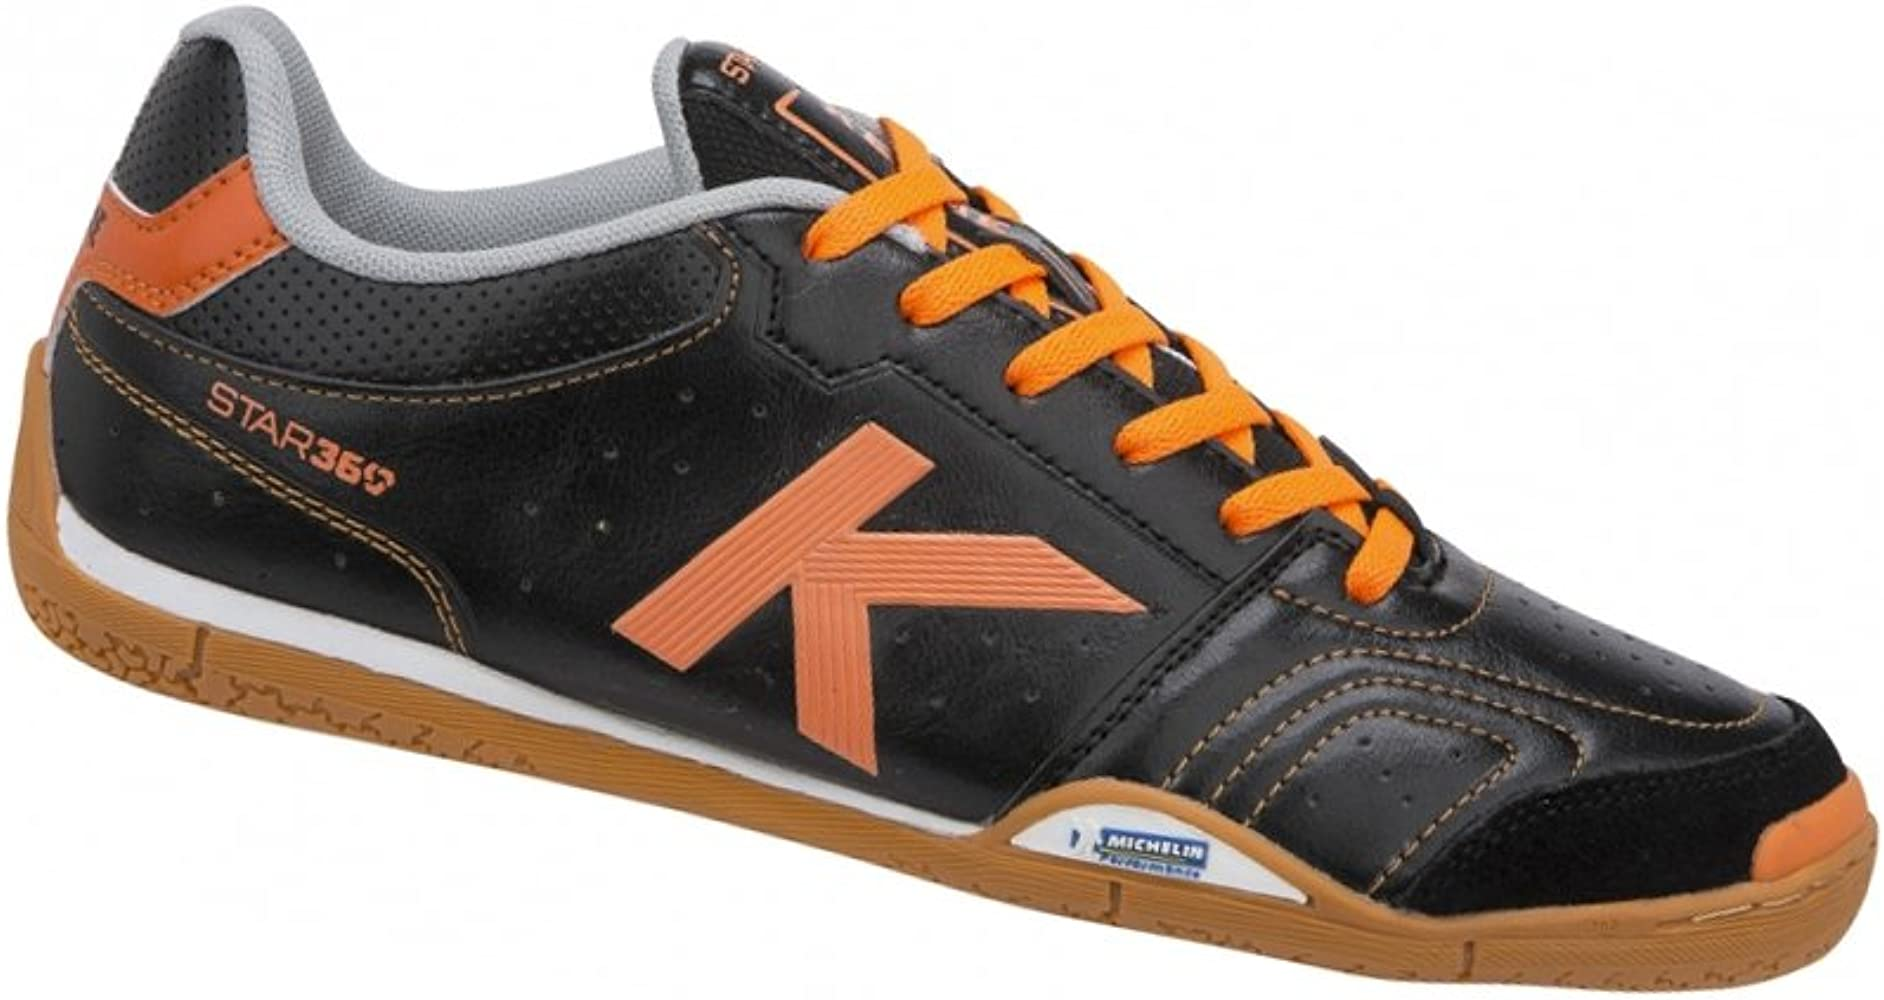 KELME|S-ROX - Zapatillas Fútbol Sala Star Free Kelme Hombre Negro ...